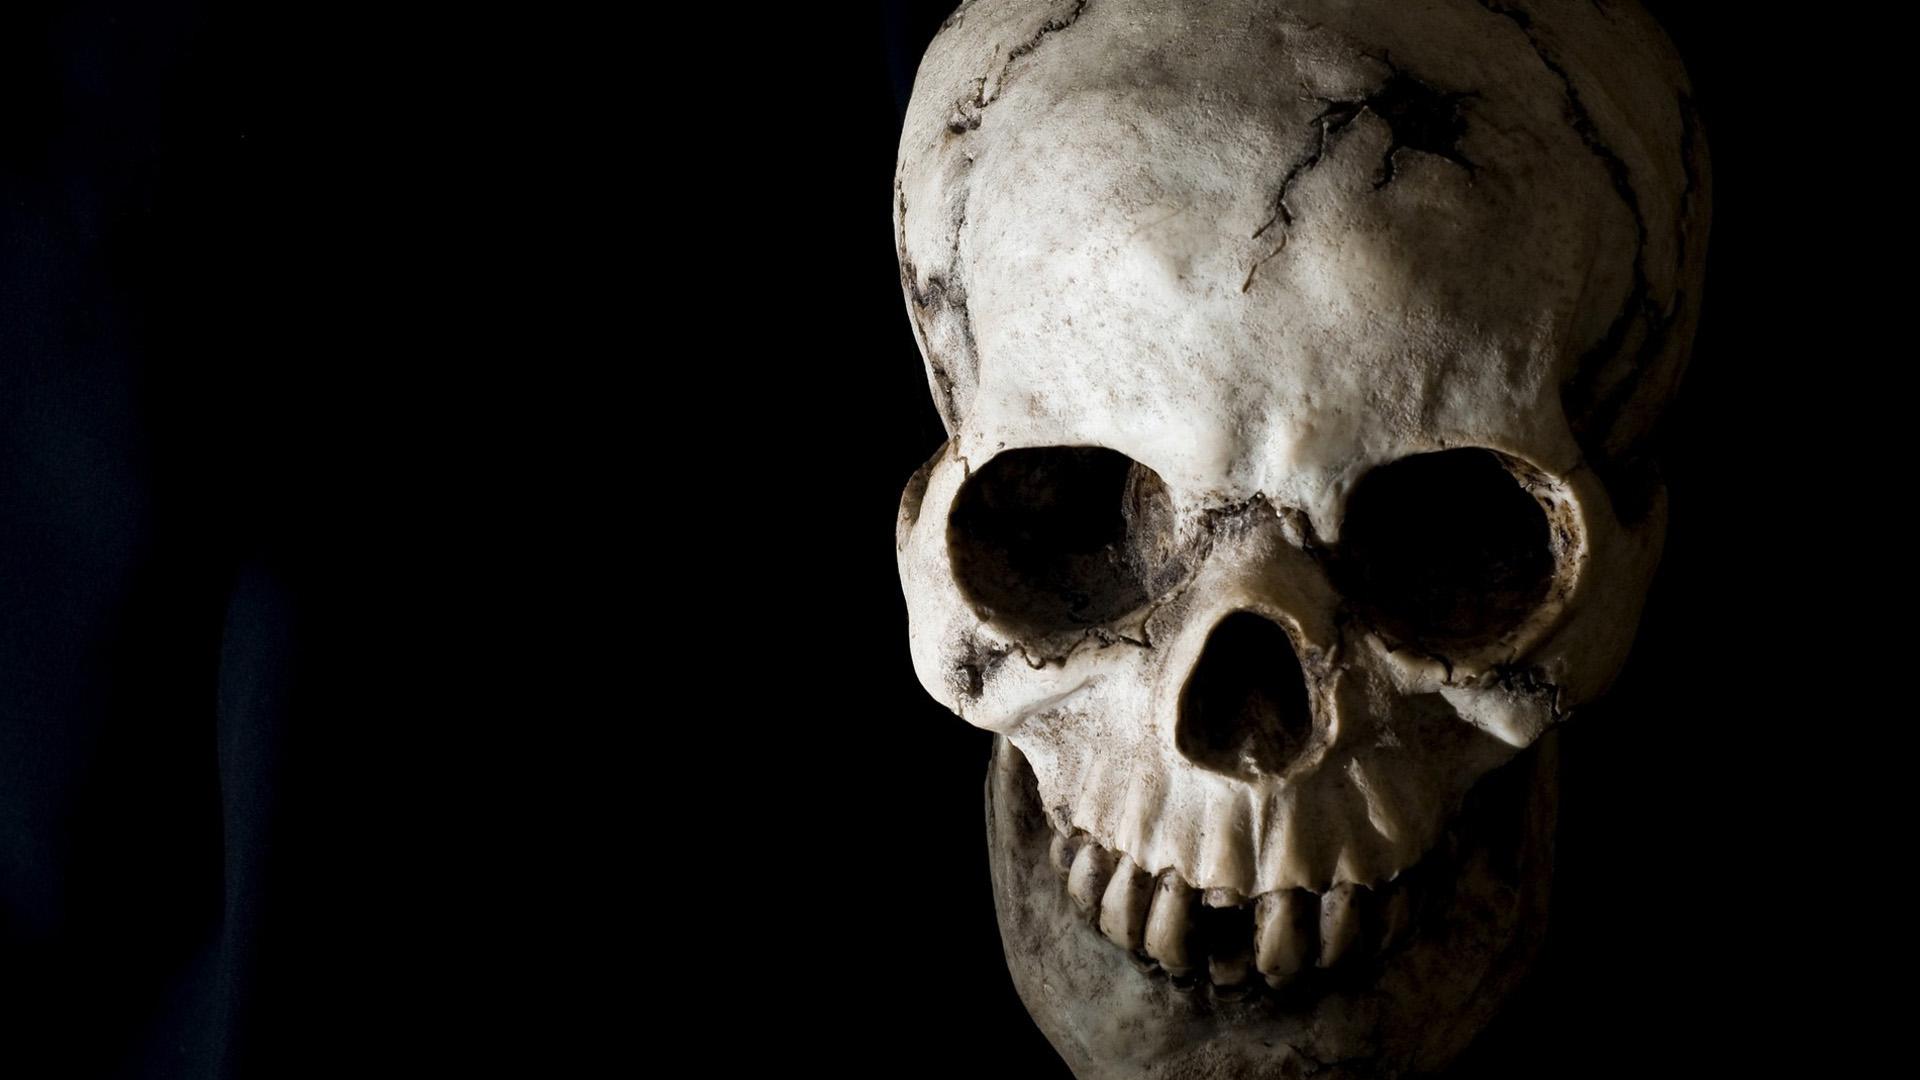 Download Skeleton Wallpaper Hd Hd Backgrounds Download